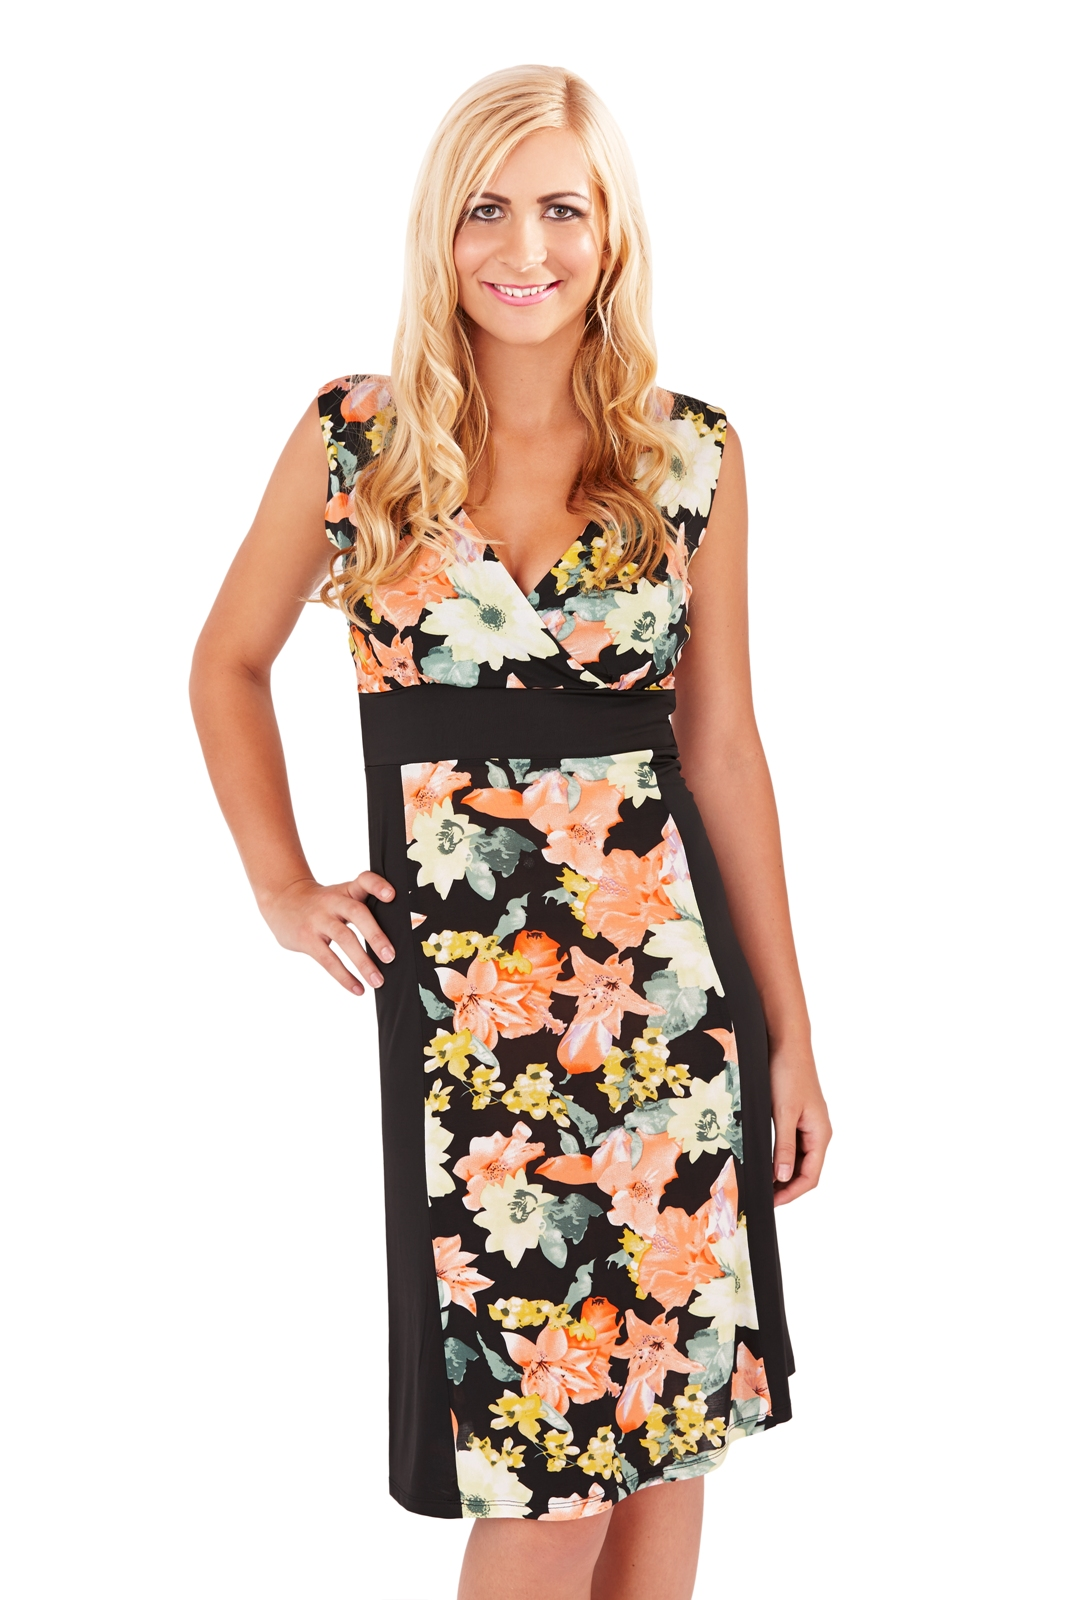 34b67eb5b65d Womens Midi Dress Mid Length Floral Stretch Panel Summer Dress Ladies Size  8-16